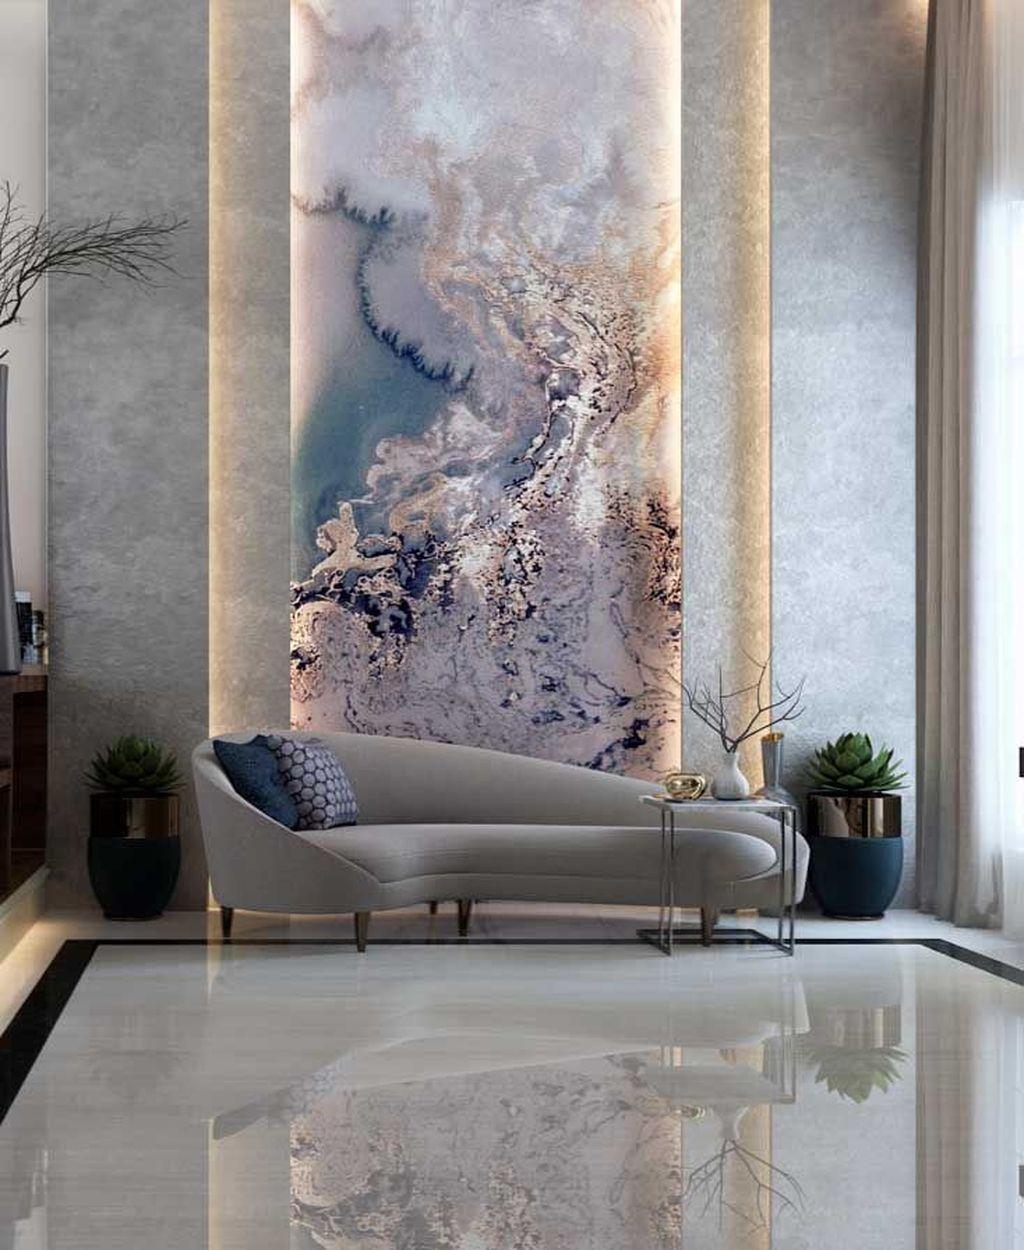 35 Gorgeous Living Room Wall Decor Ideas That Looks So Cute Luxury Living Room Living Room Design Modern Elegant Living Room